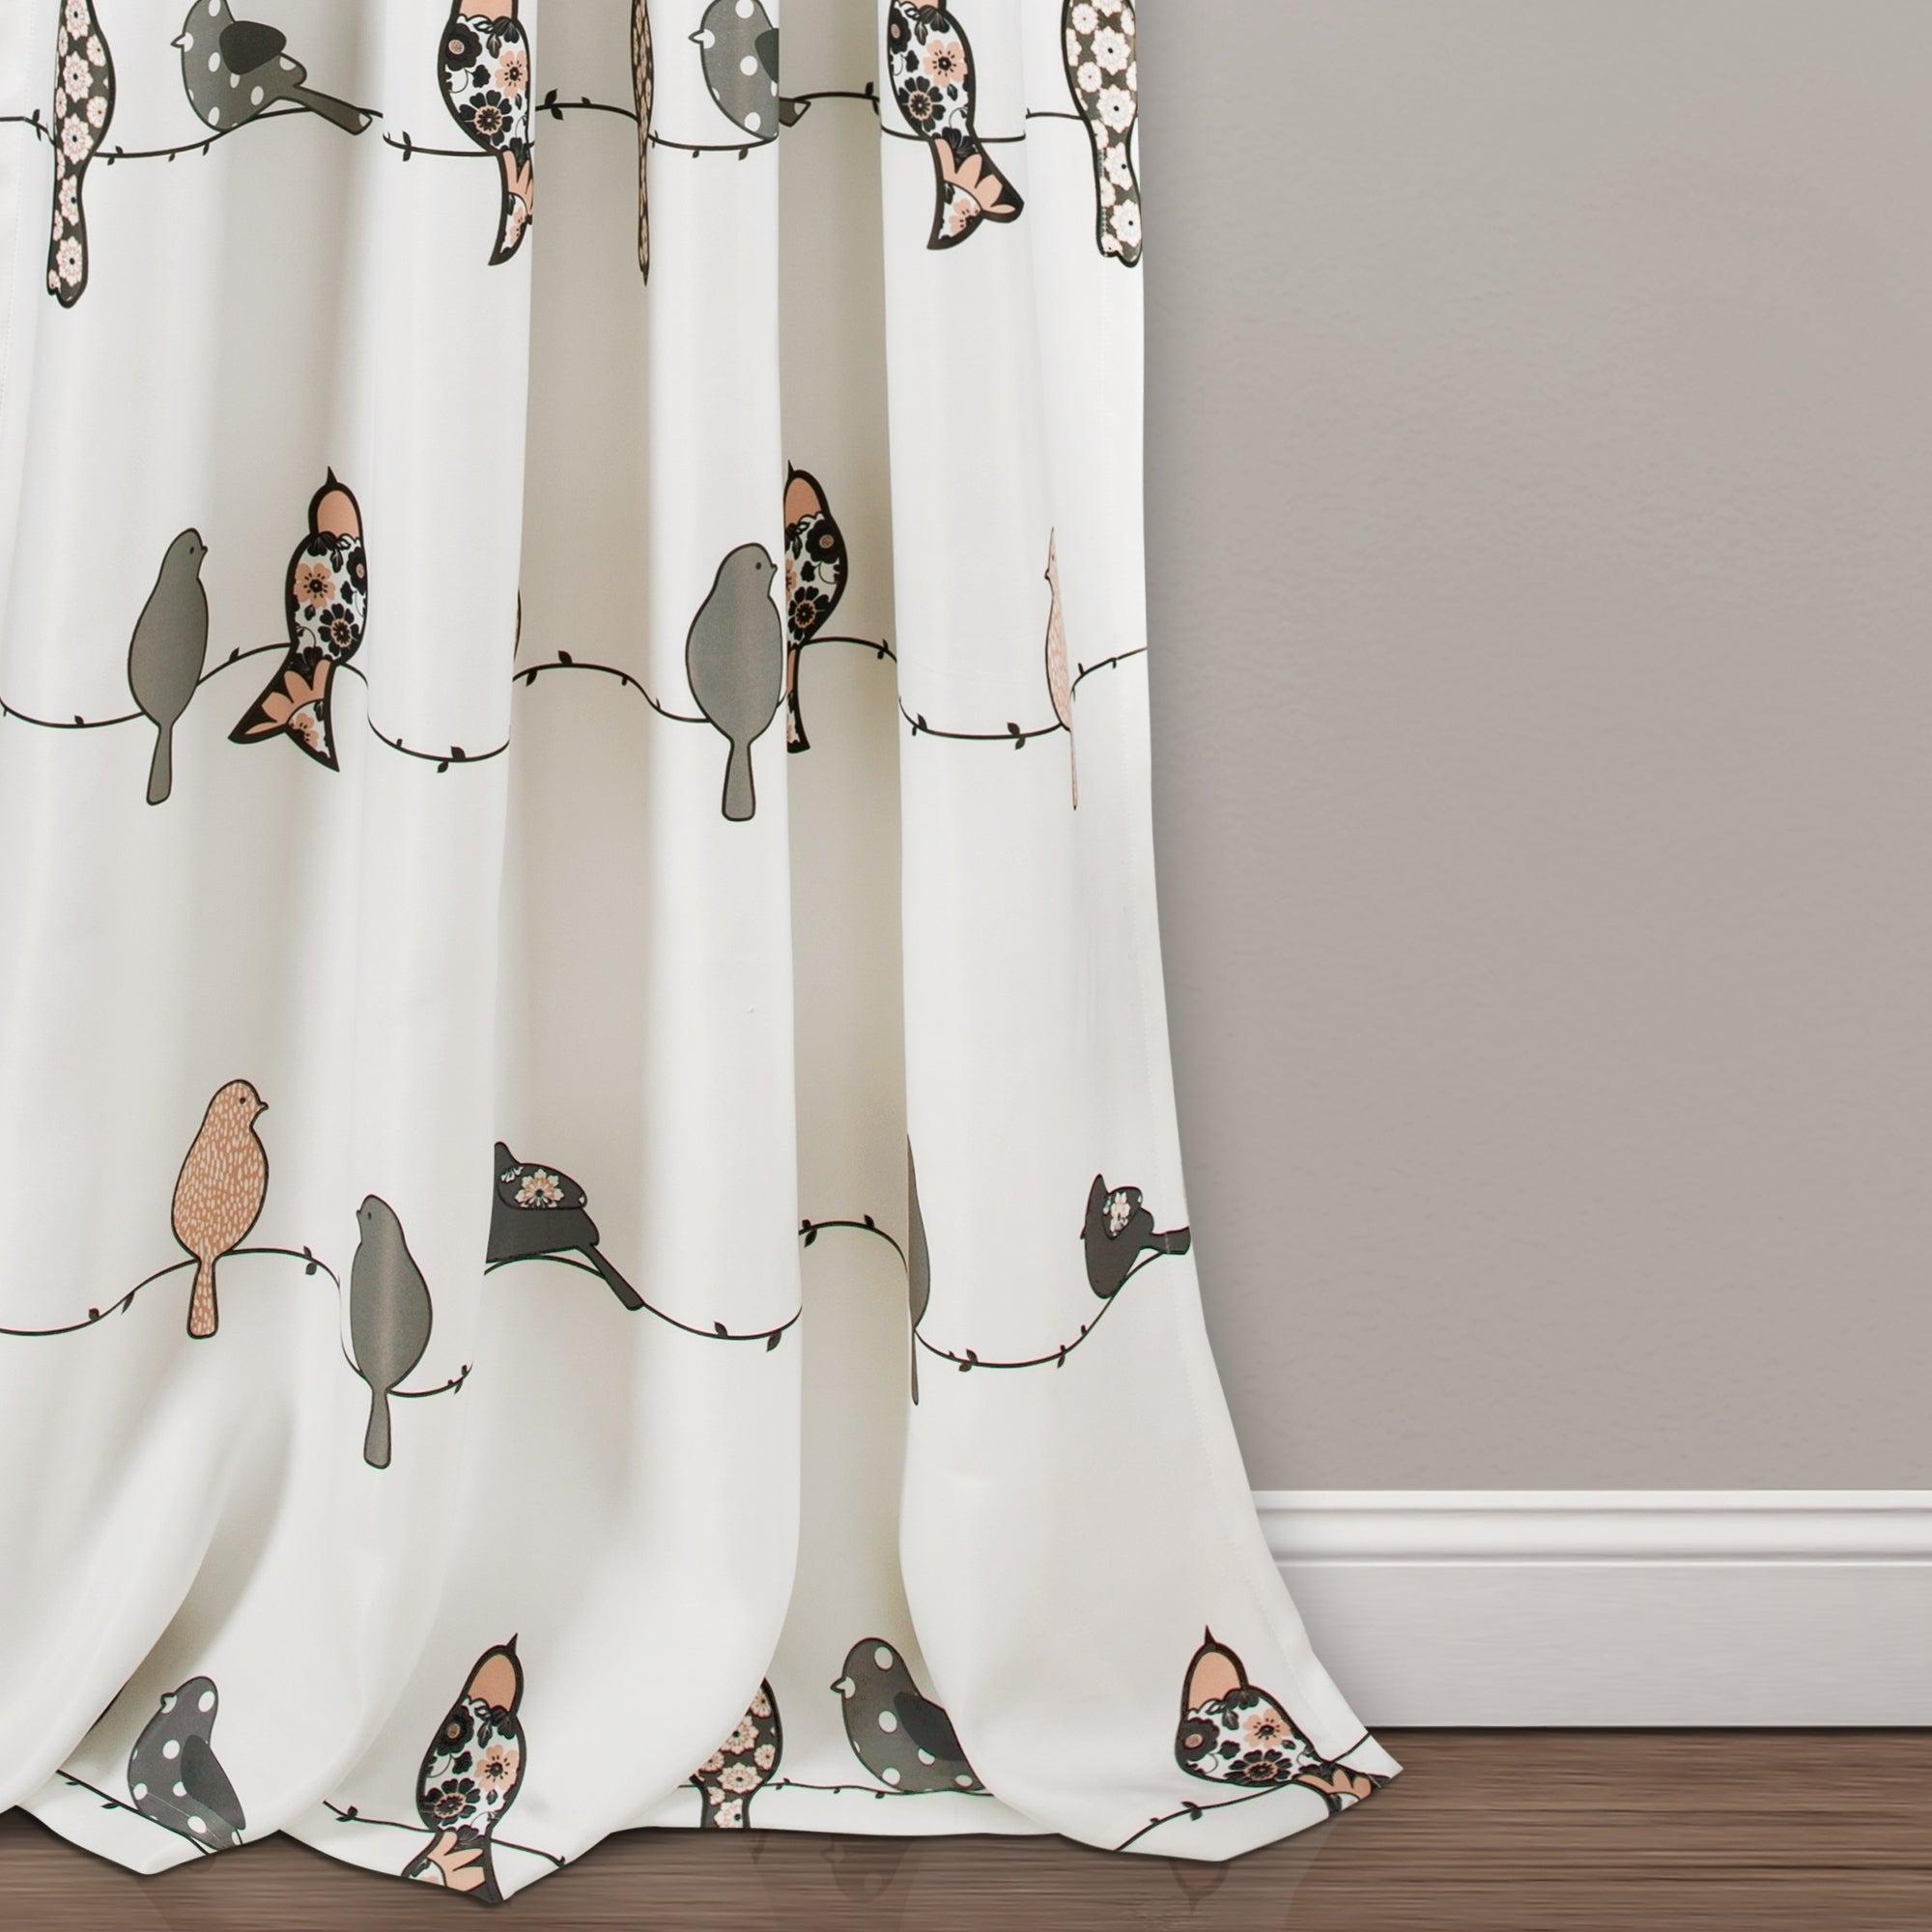 Lush Decor Rowley Birds Room Darkening Curtain Panel Pair In Rowley Birds Room Darkening Curtain Panel Pairs (View 3 of 20)